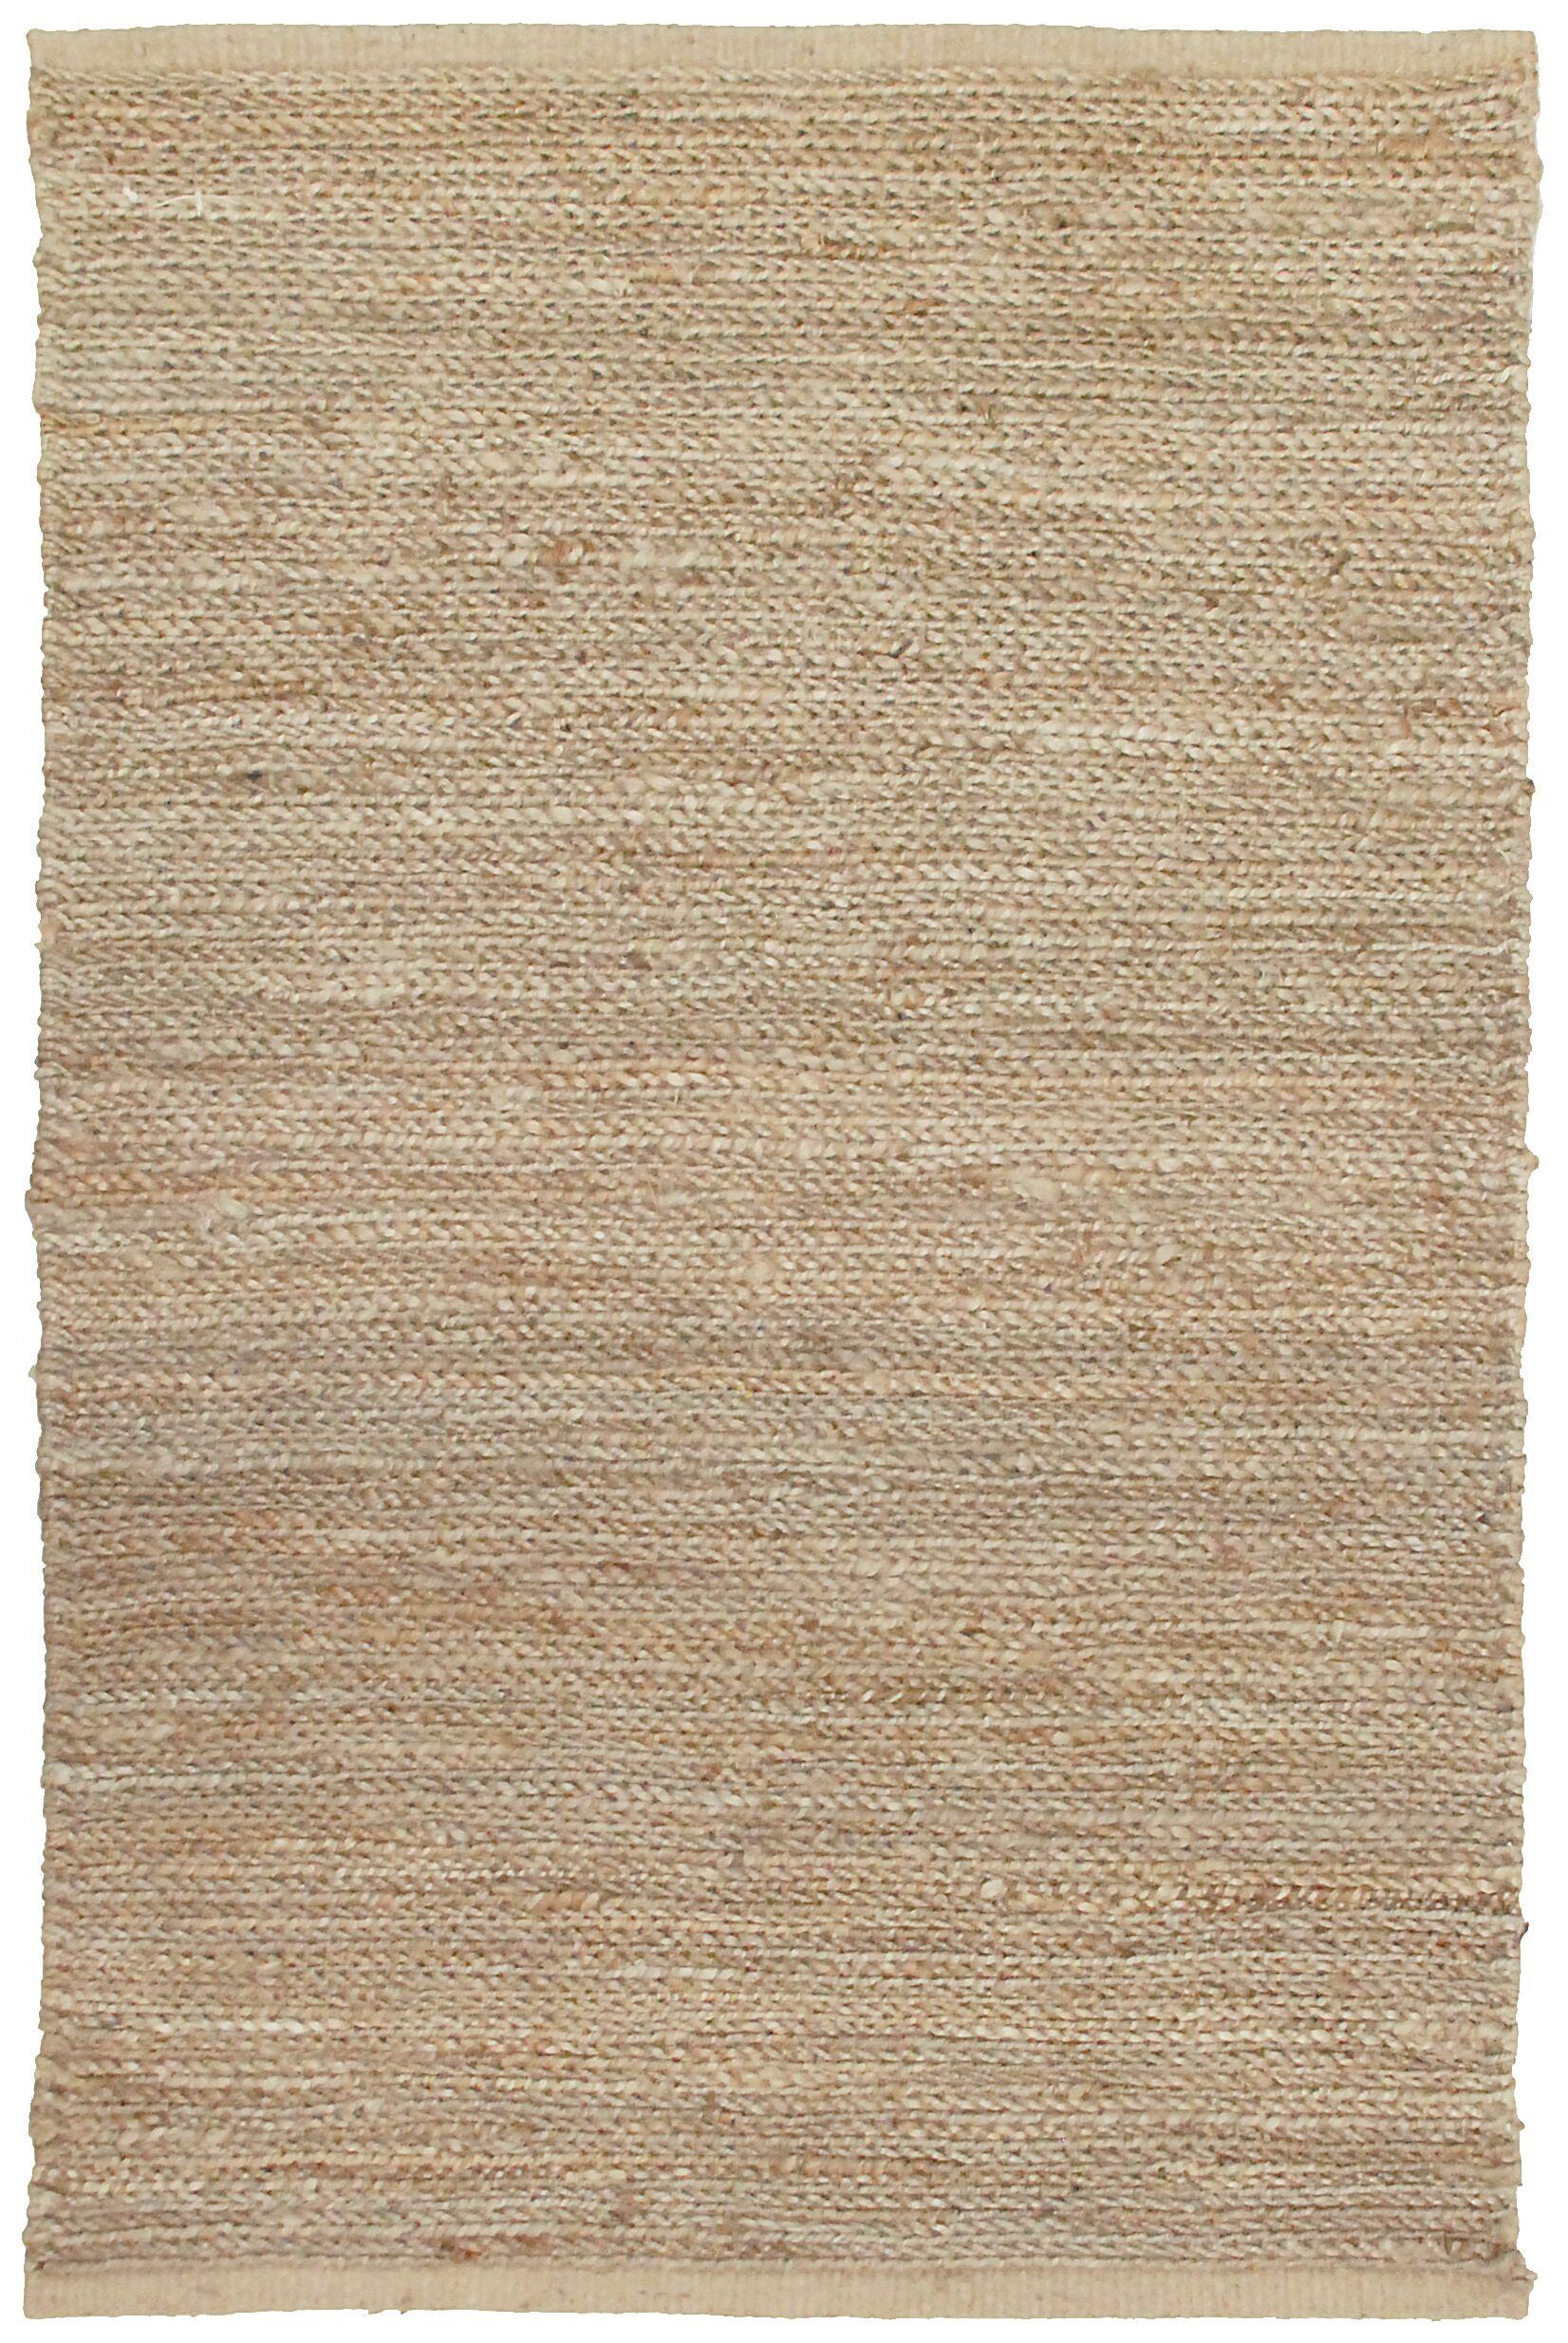 Soumakh Jute Natural Area Rug Rug Size: Rectangle 8' x 10'